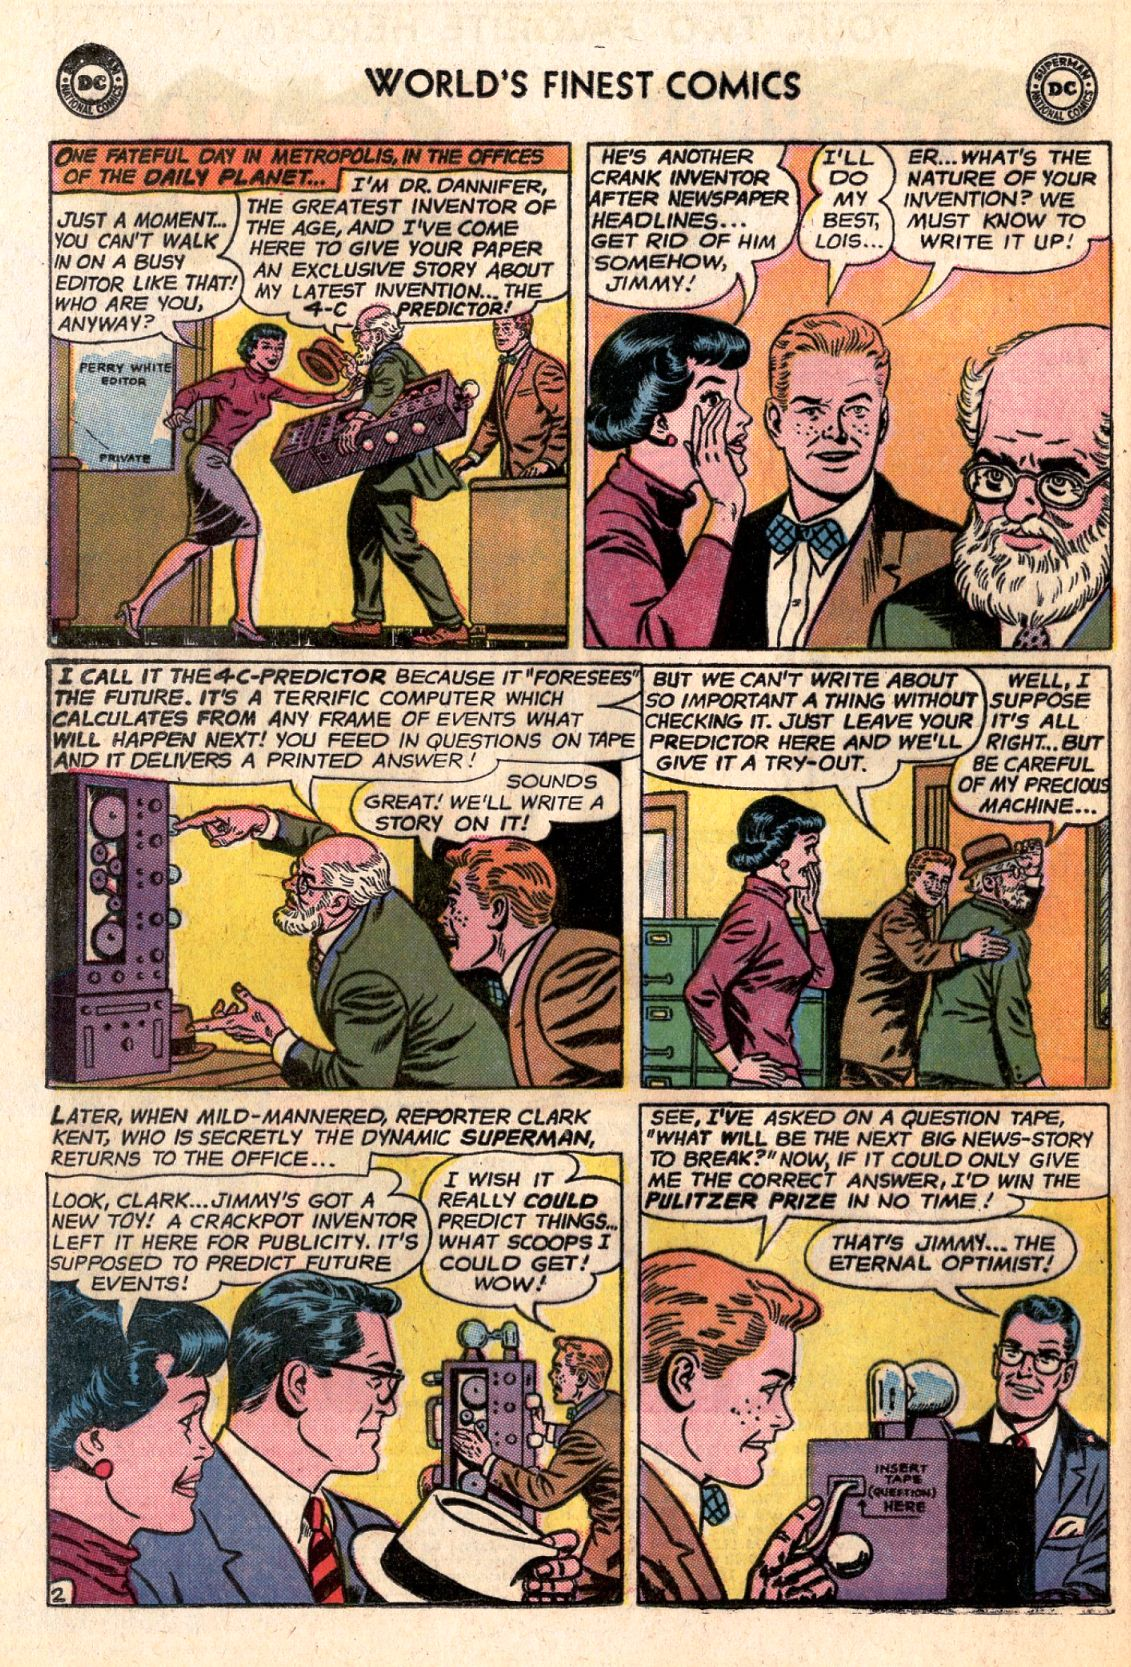 Read online World's Finest Comics comic -  Issue #141 - 4